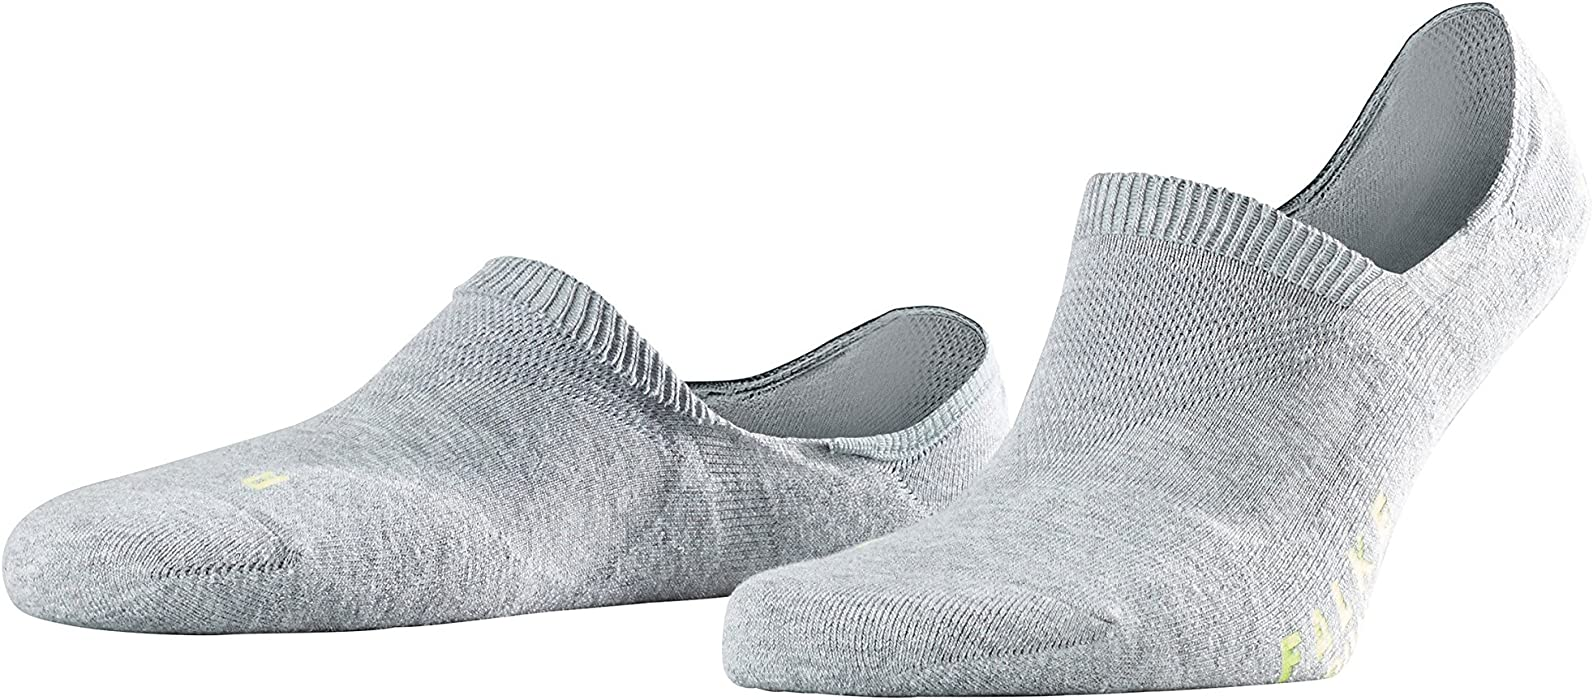 aanbod New York populaire winkels Men's Cool Kick Invisible Sock Sockshosiery, -Light Grey, Sock Size: One  Size/Shoe Size:6-12